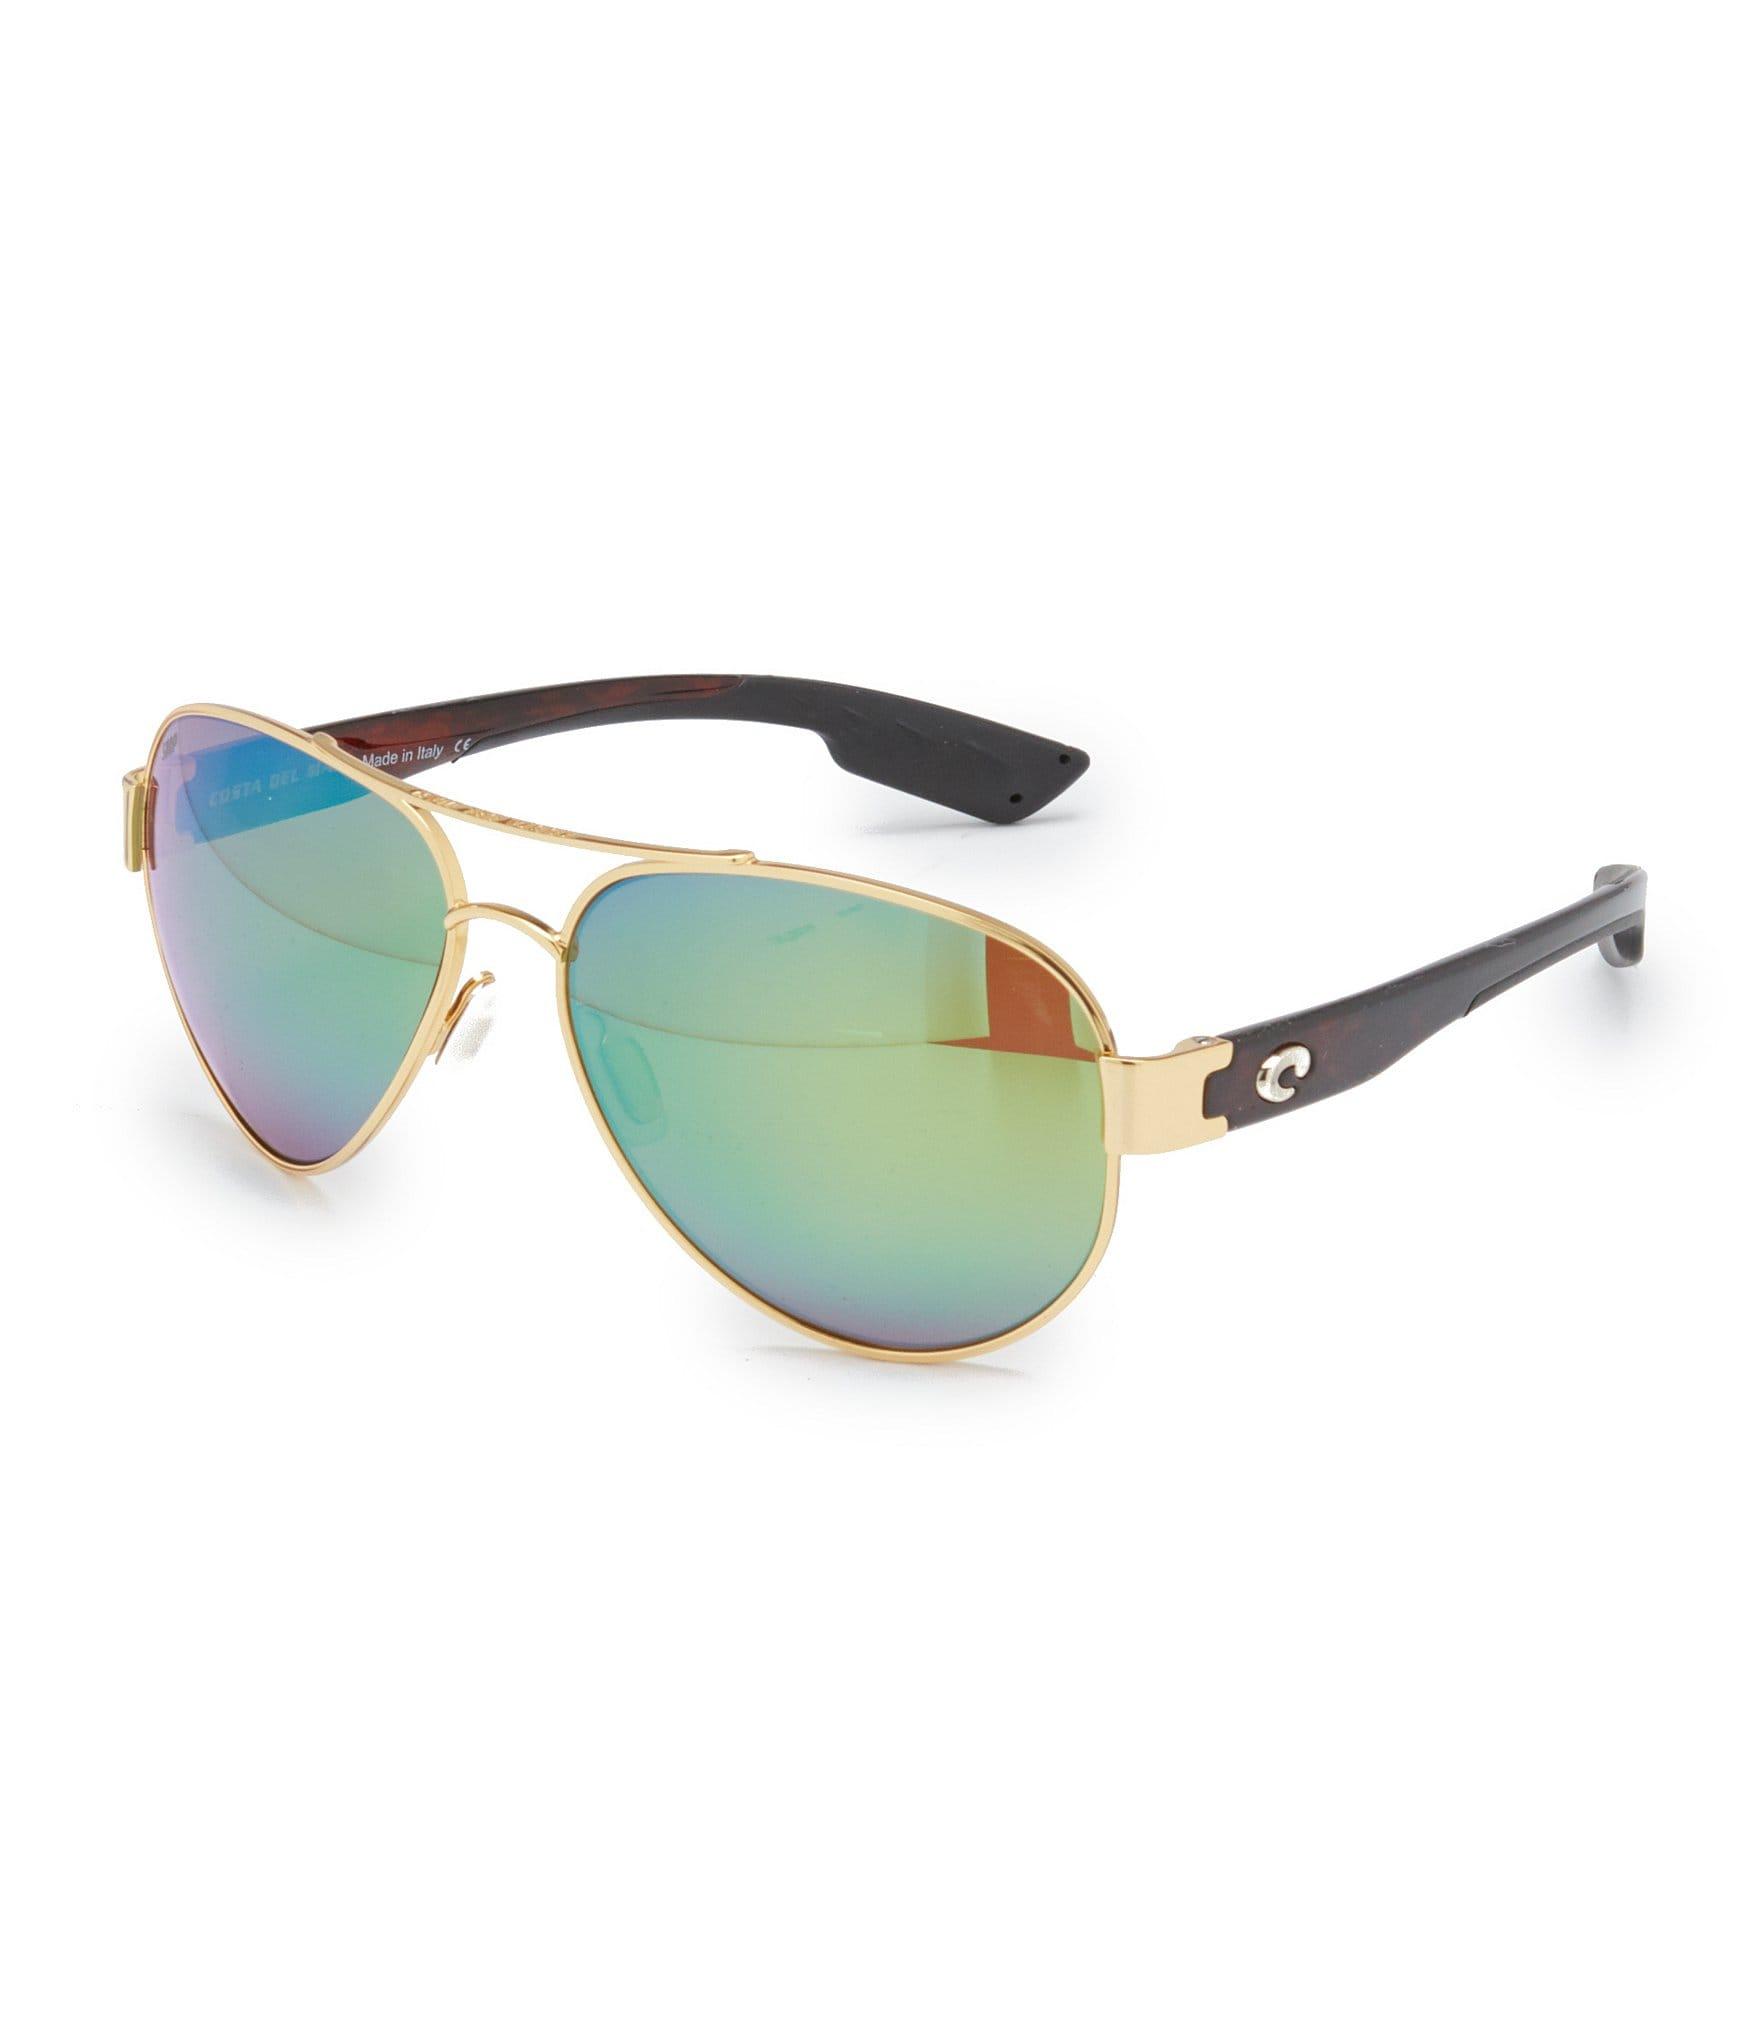 3096a707c30a Costa Men's Polarized Sunglasses   Dillard's